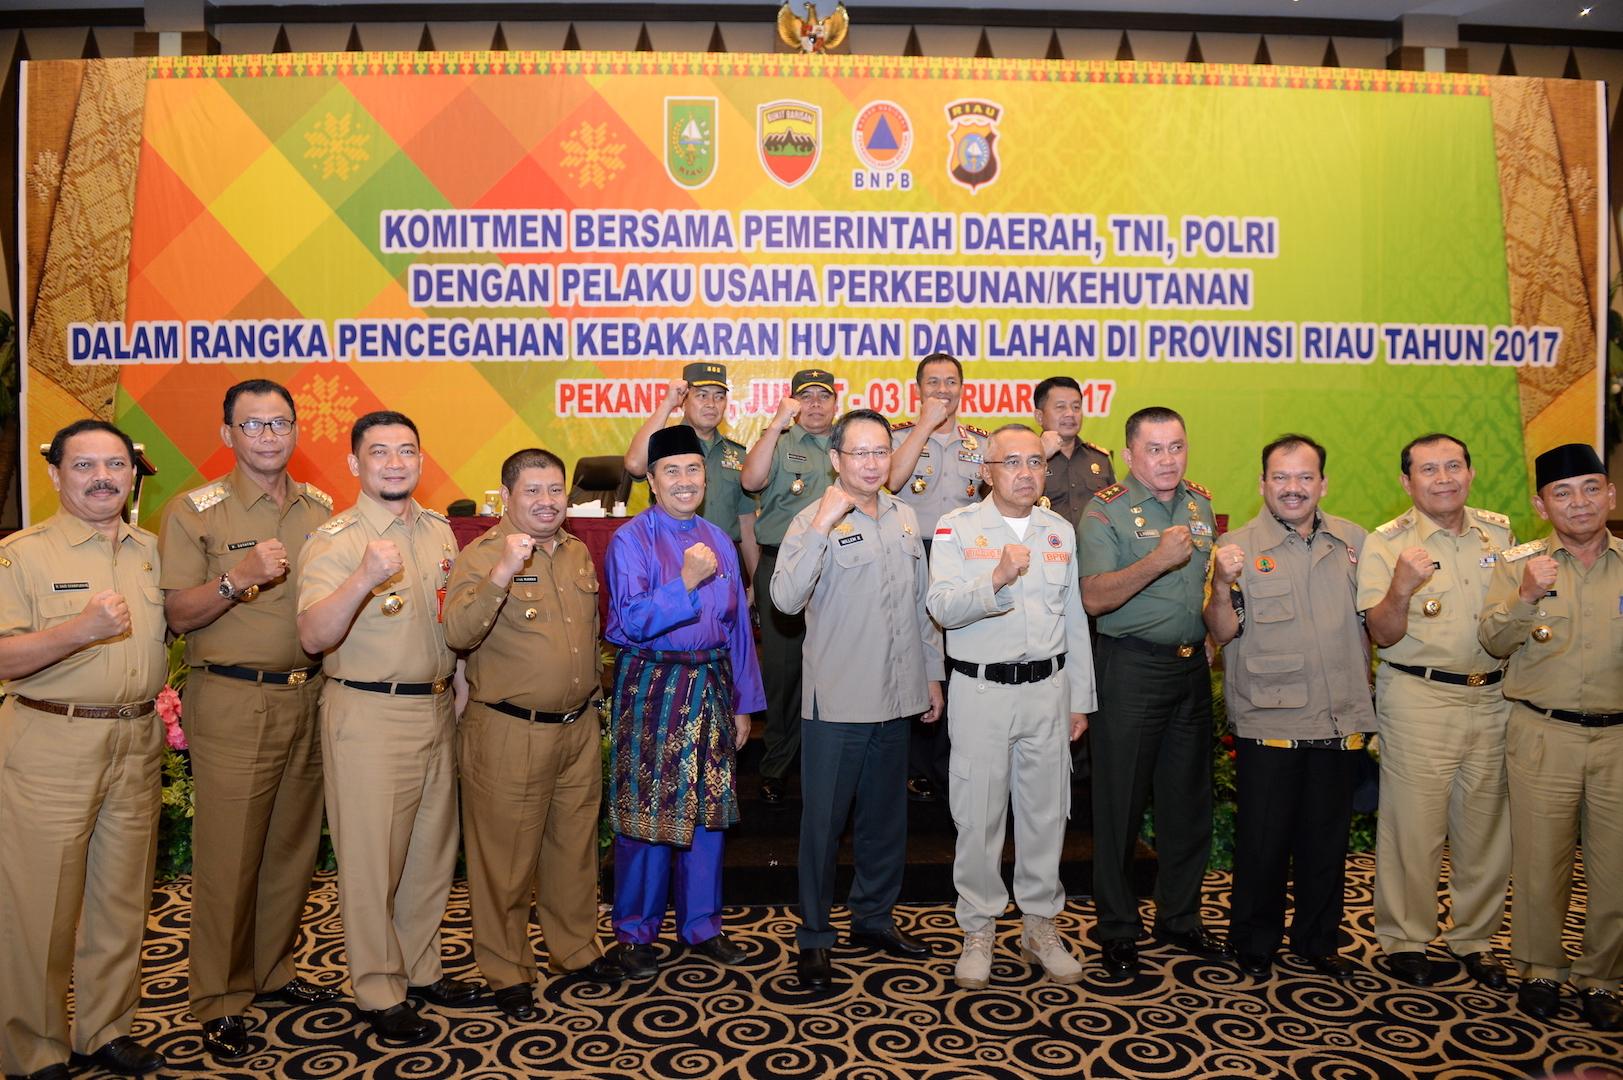 Gubri photo bersama saat Komitmen Bersama Pemerintah Daerah, TNI, POLRI dengan Pelaku Usaha Perkebunan_Kehutanan dalam Rangka Pencegahan KARHUTLA di Prov Riau Tahun 2017 di H Pangeran